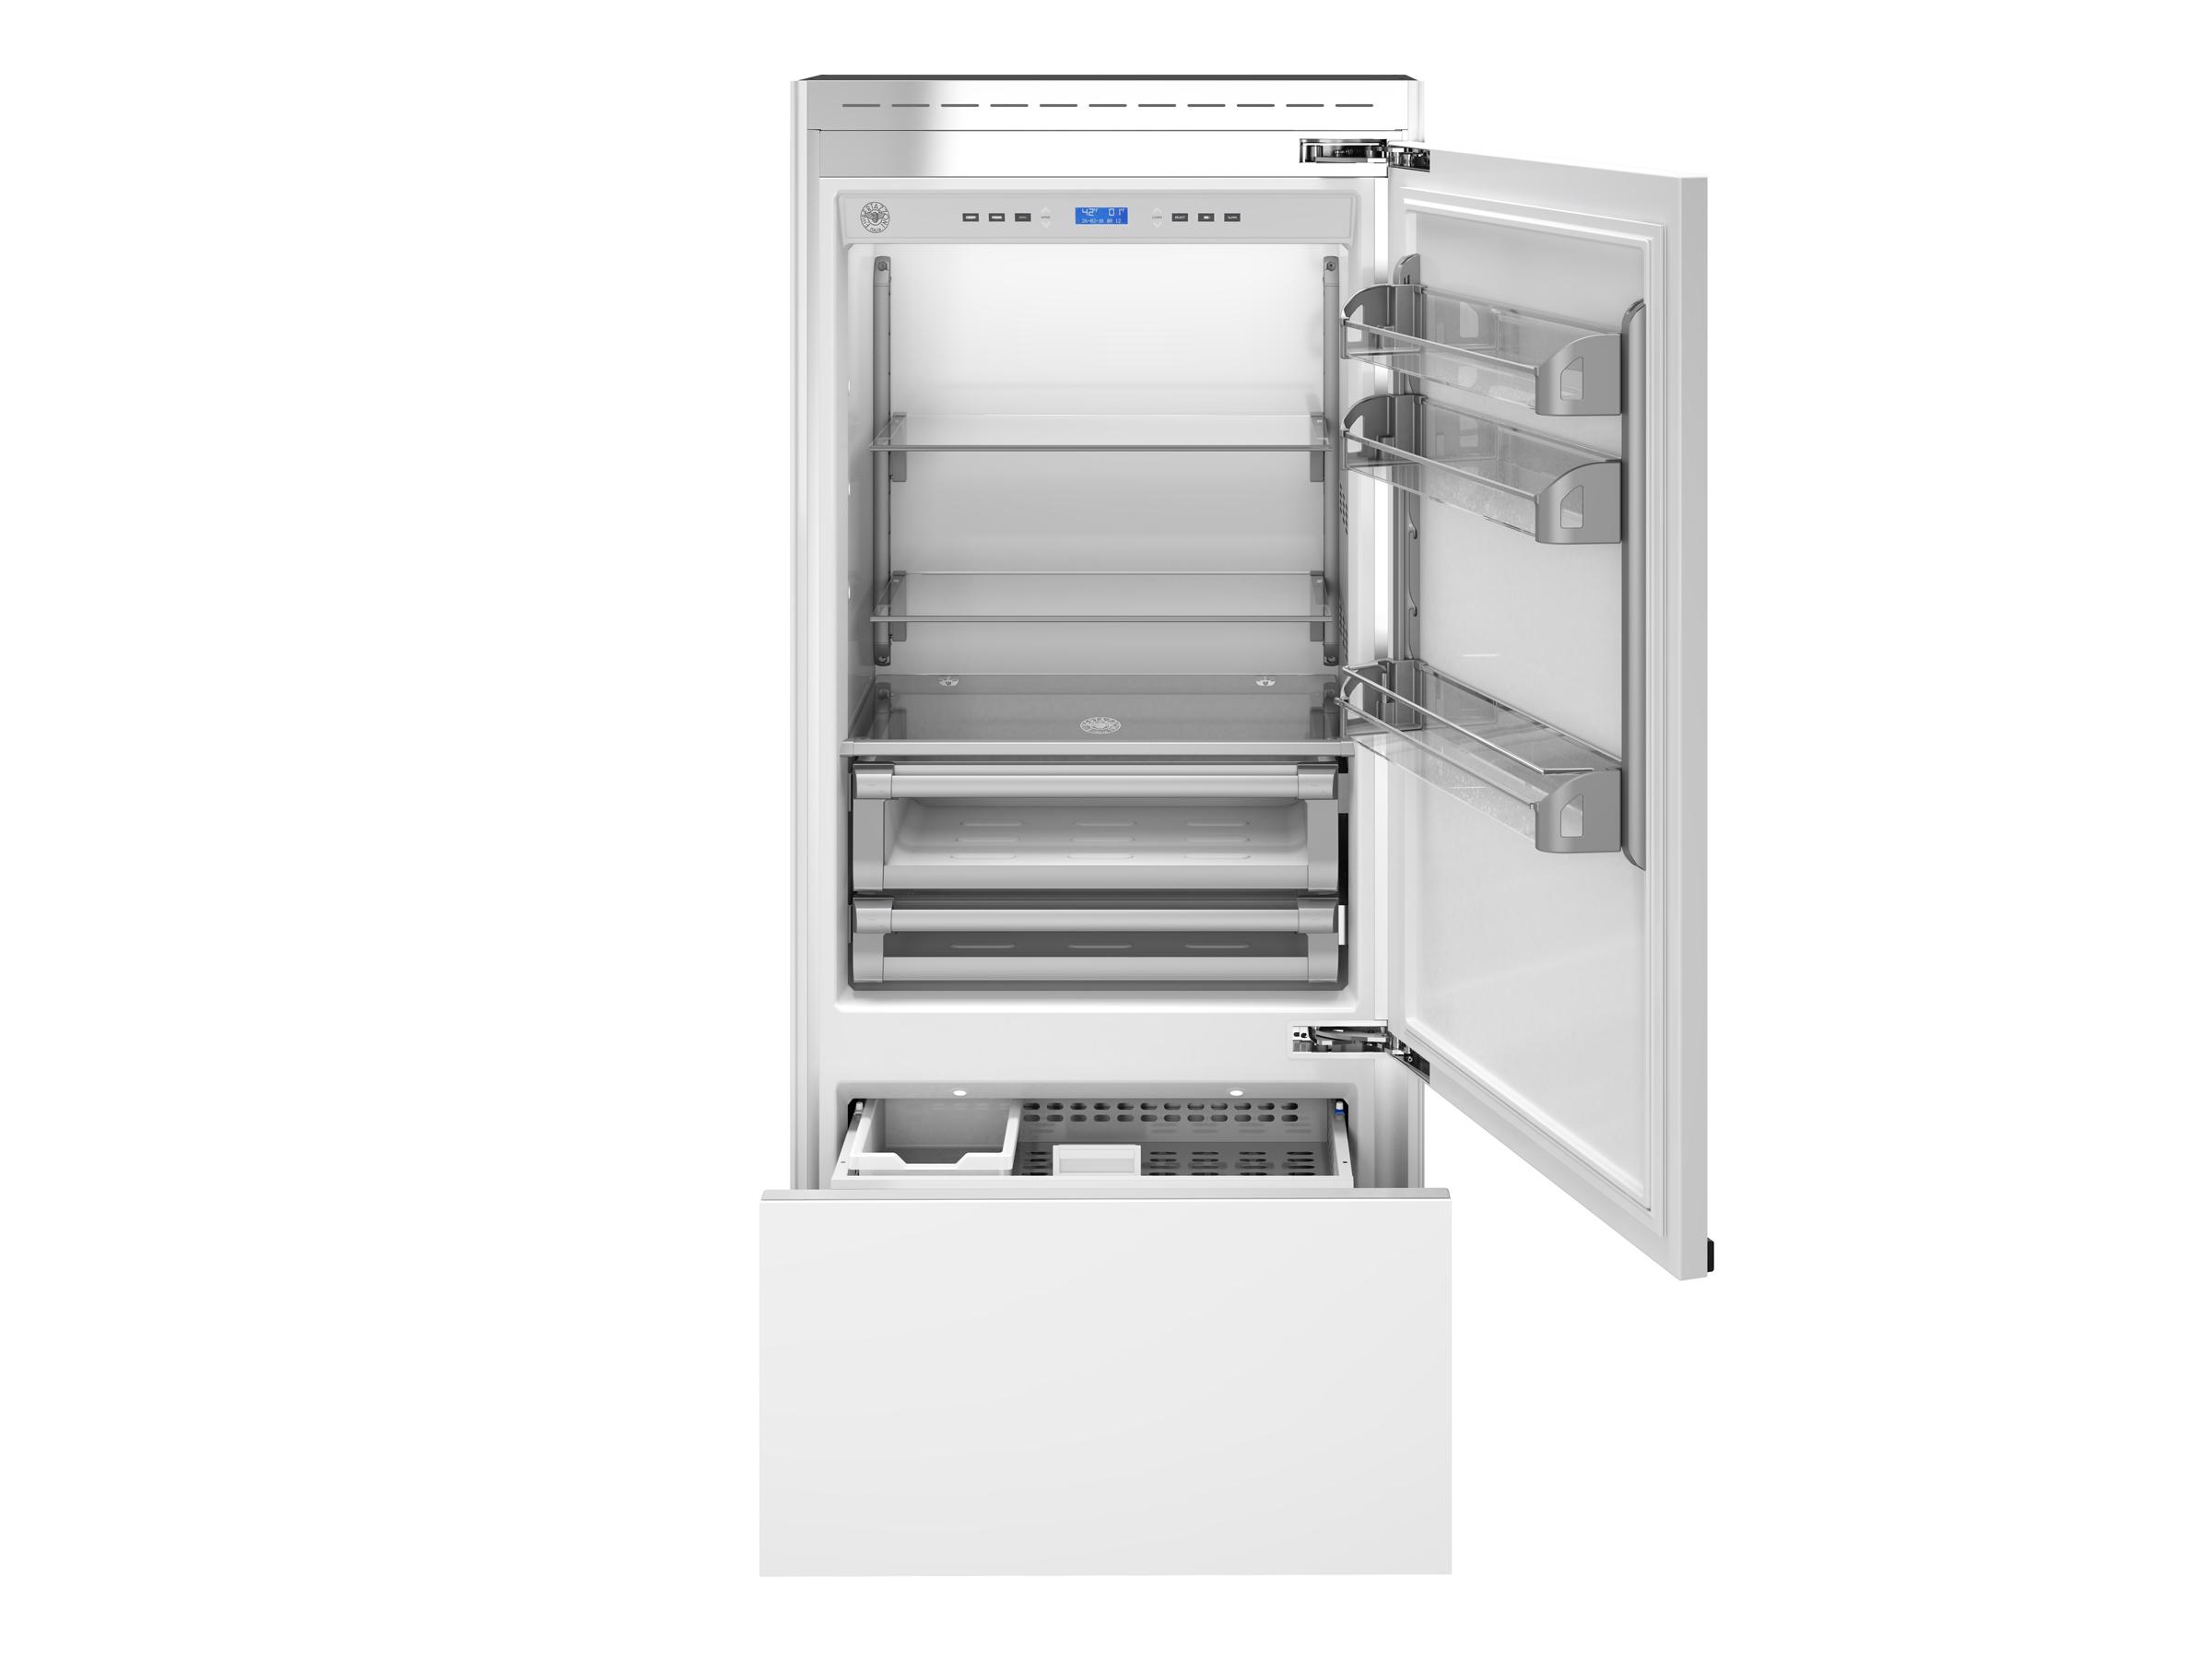 "Model: REF36PRR   Bertazzoni 36"" Built-in refrigerator - Panel ready - Right swing door"